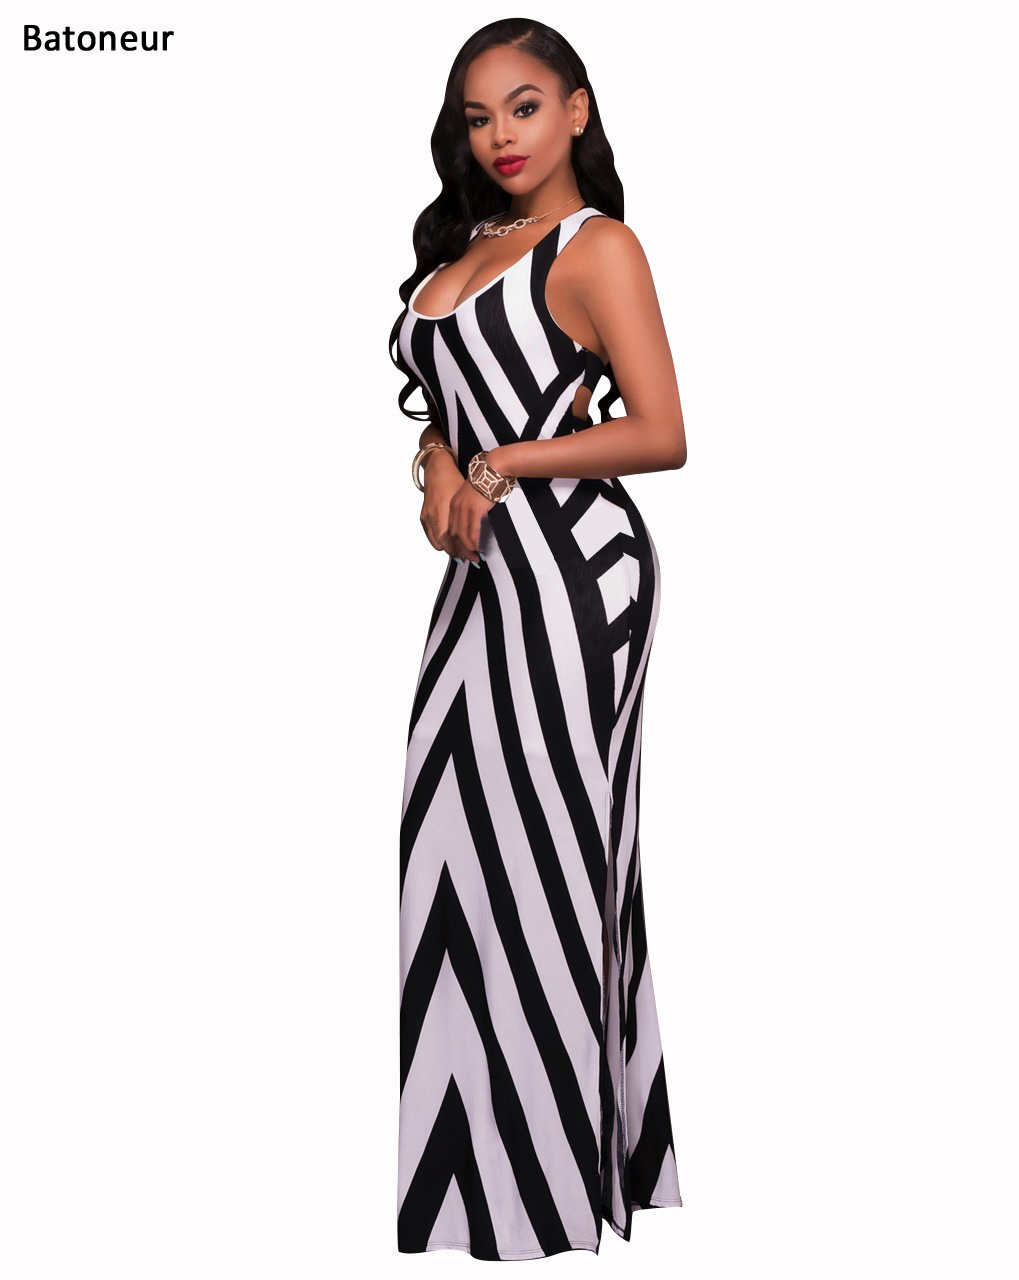 Aliexpress.com : Buy Batoneur Women Long Maxi Black White Striped ...